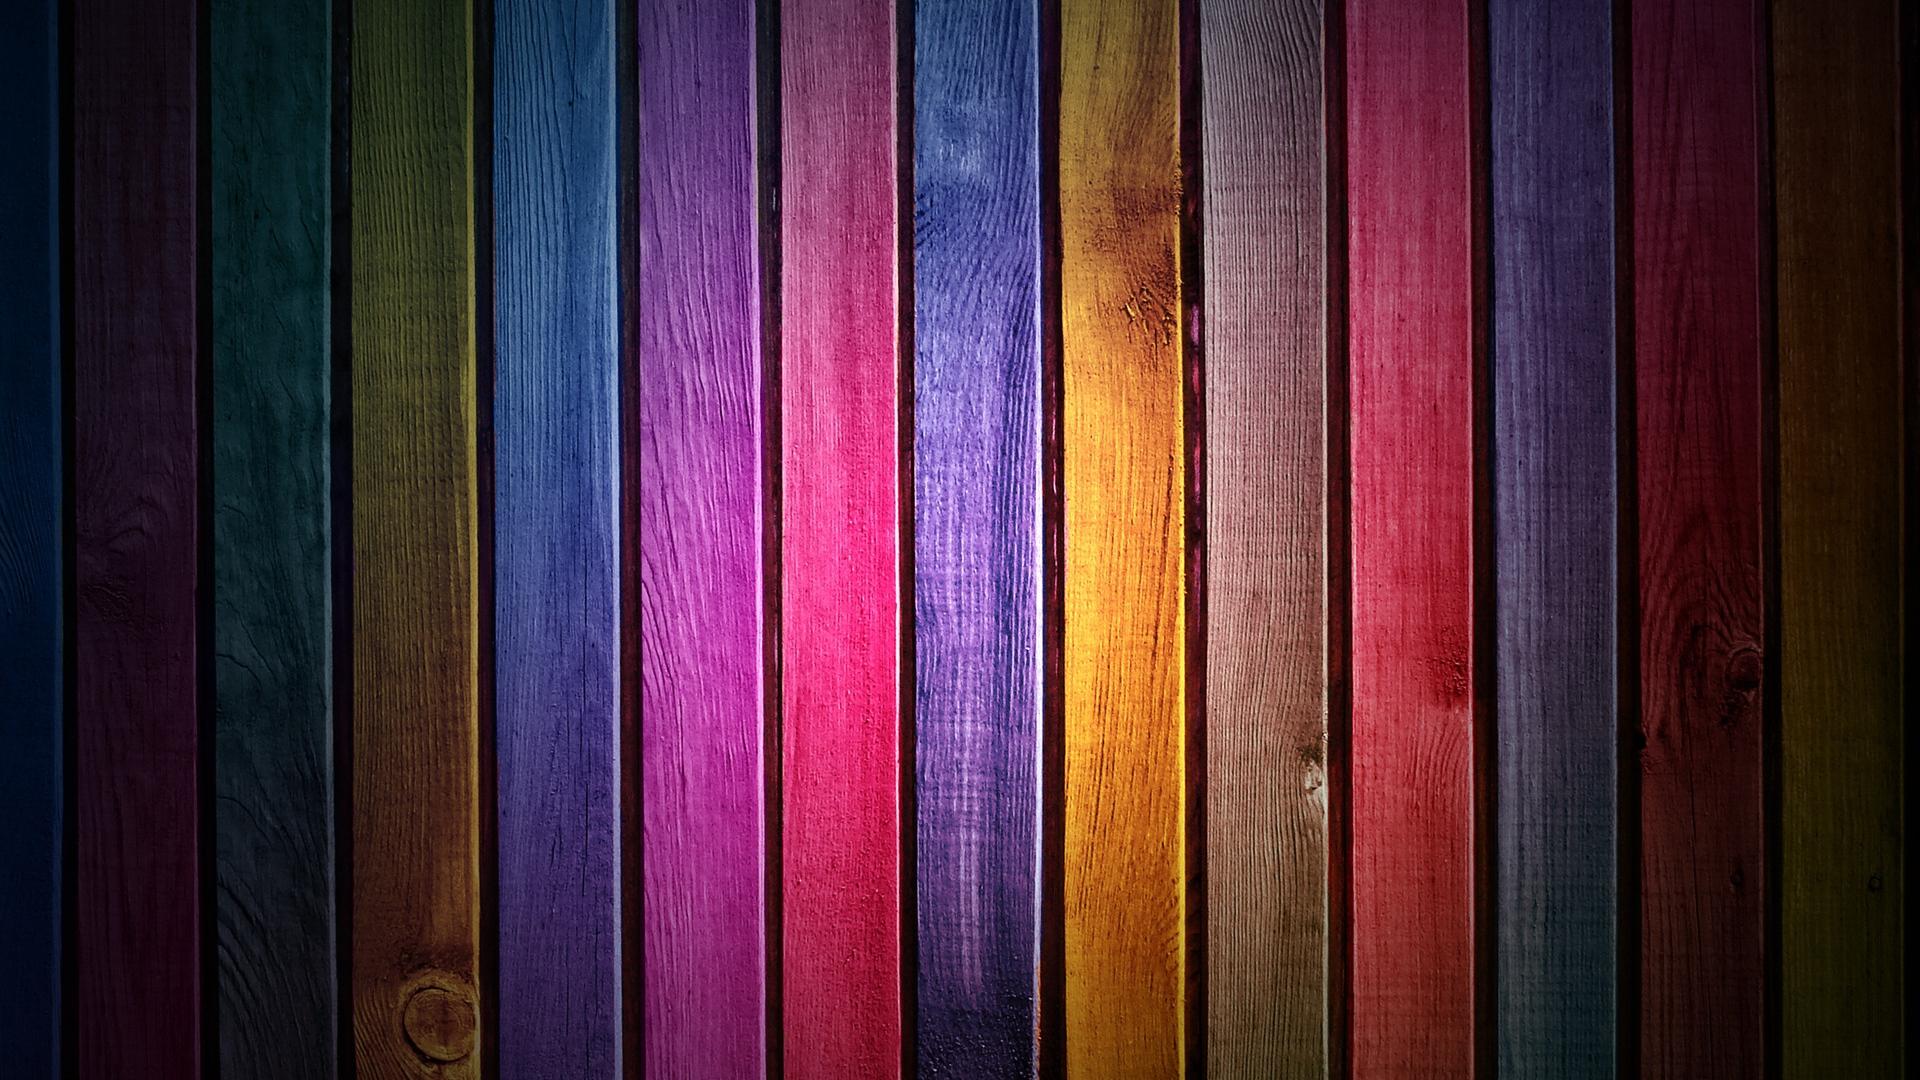 Download Wallpaper 1920x1080 Planks Strips Vertical